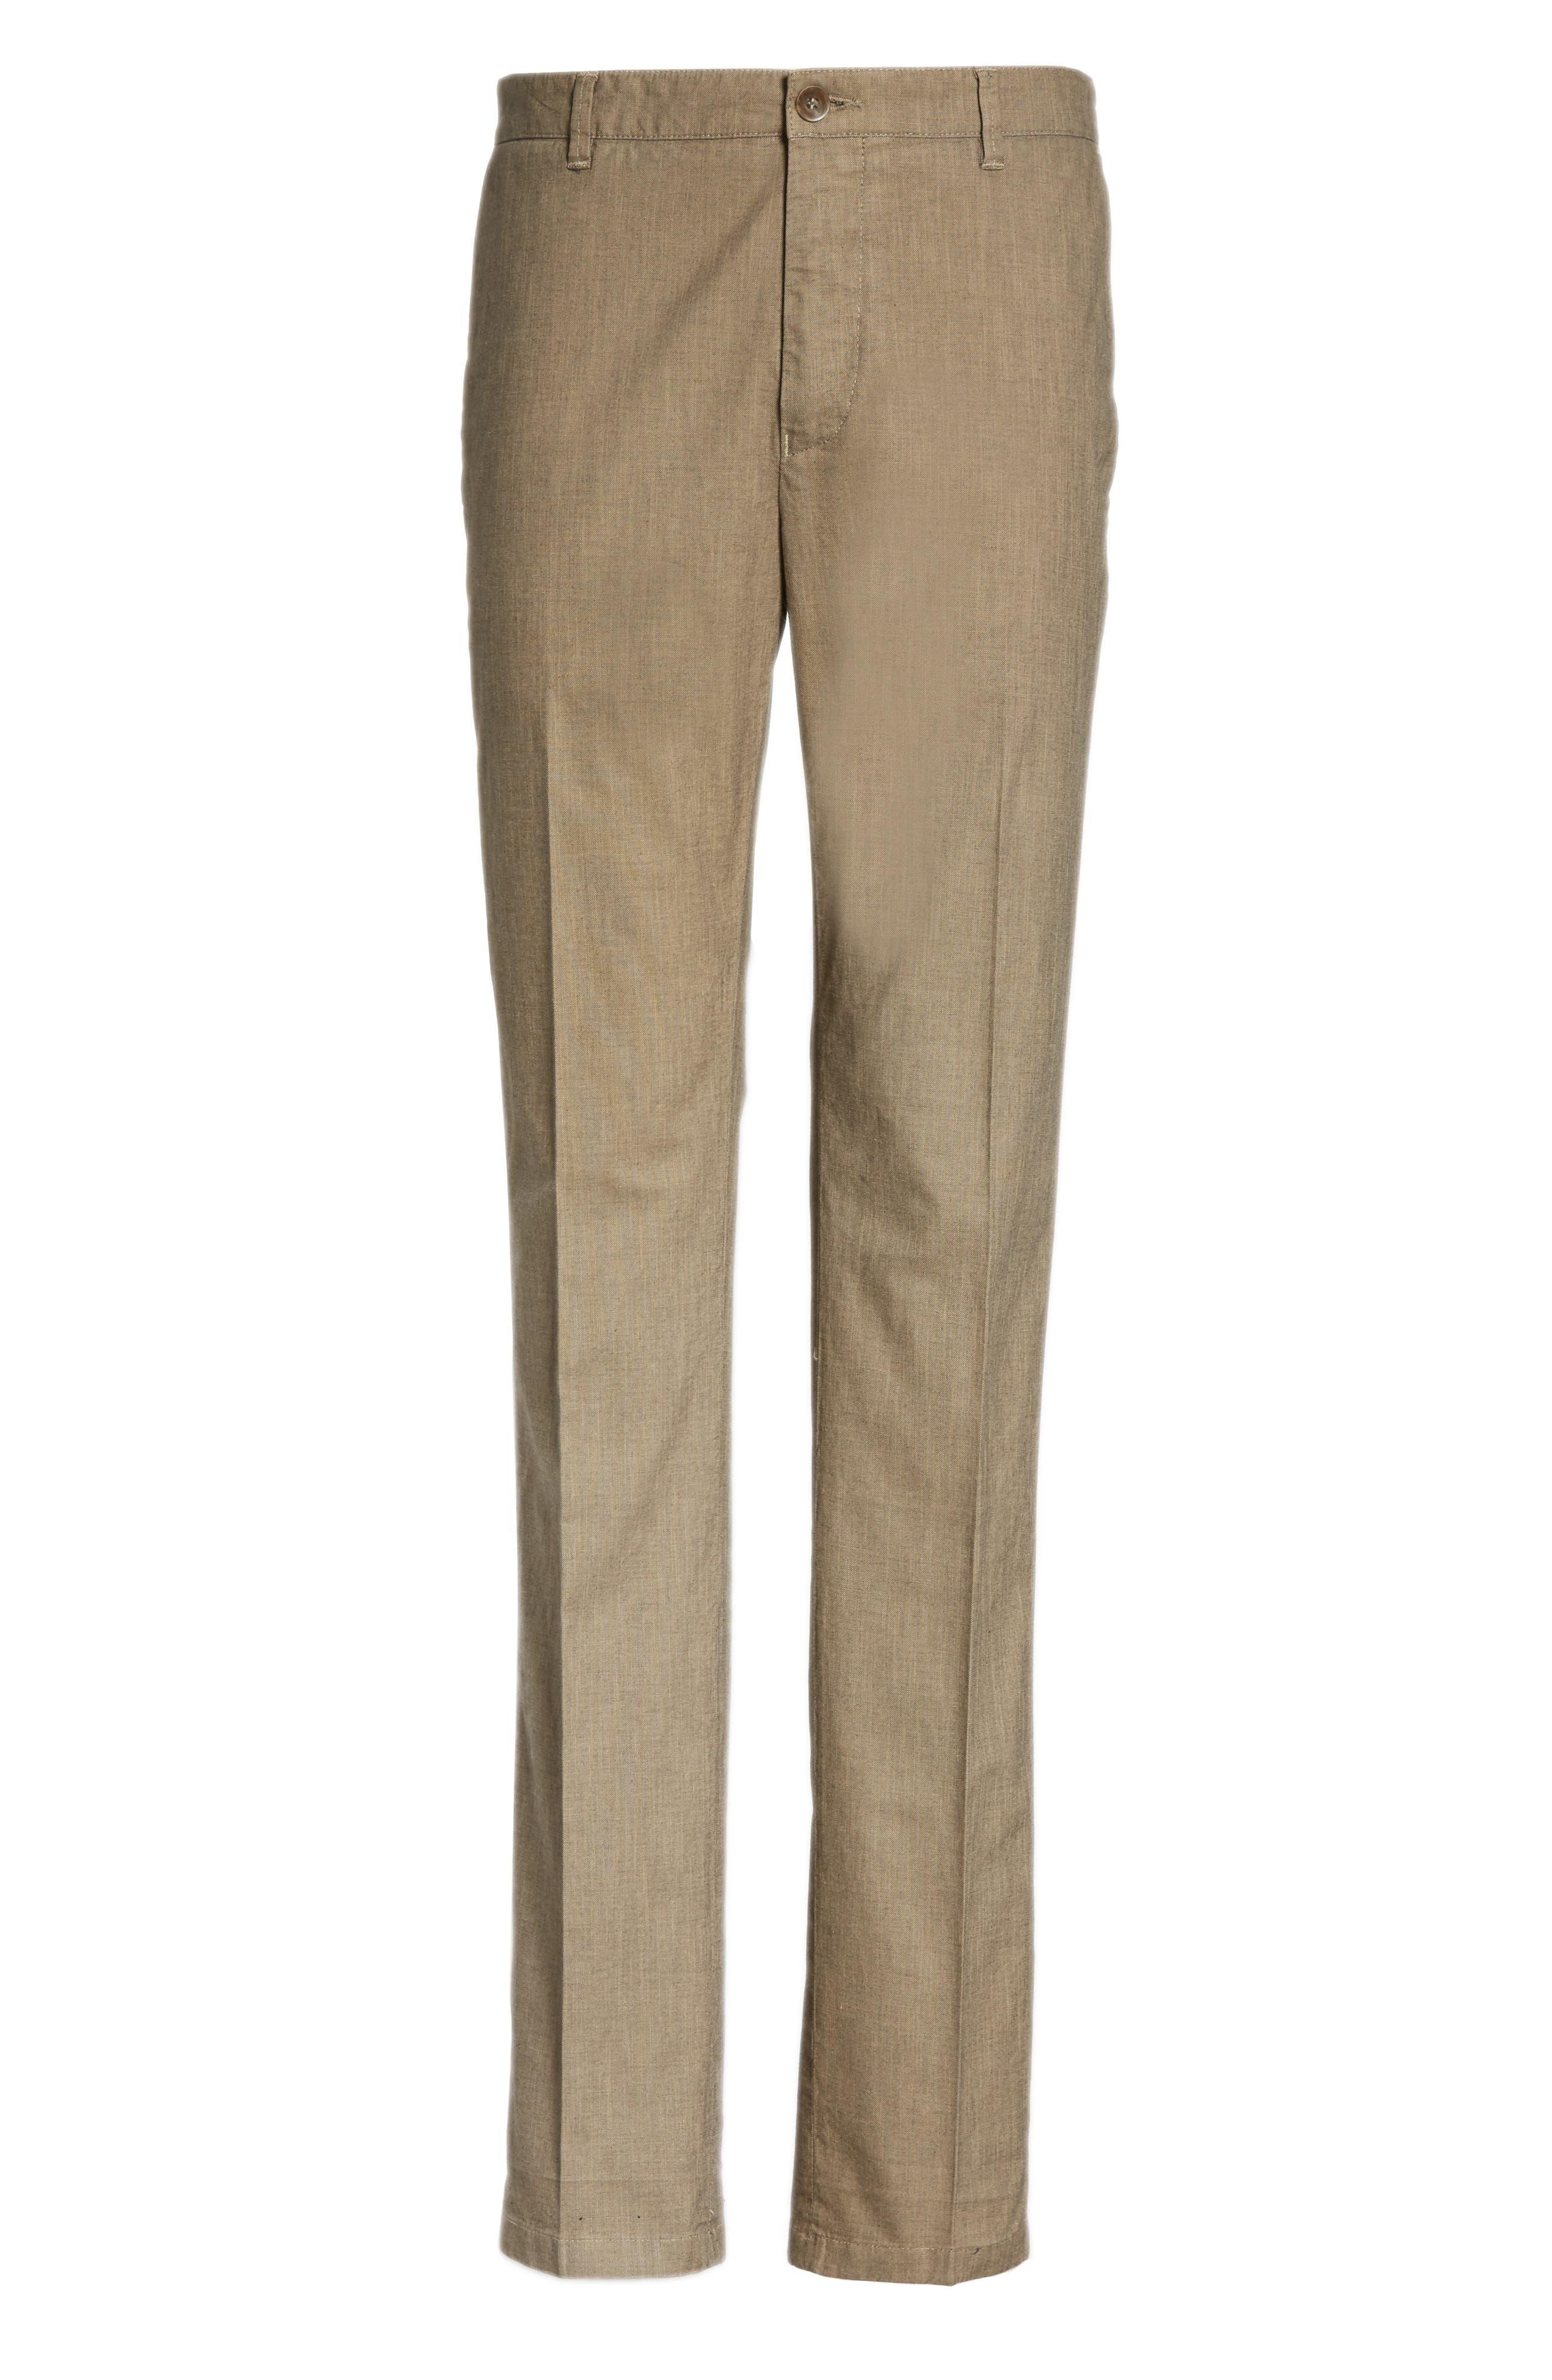 French Pocket Stretch Straight Leg Pants,                             Alternate thumbnail 6, color,                             Dark Beige